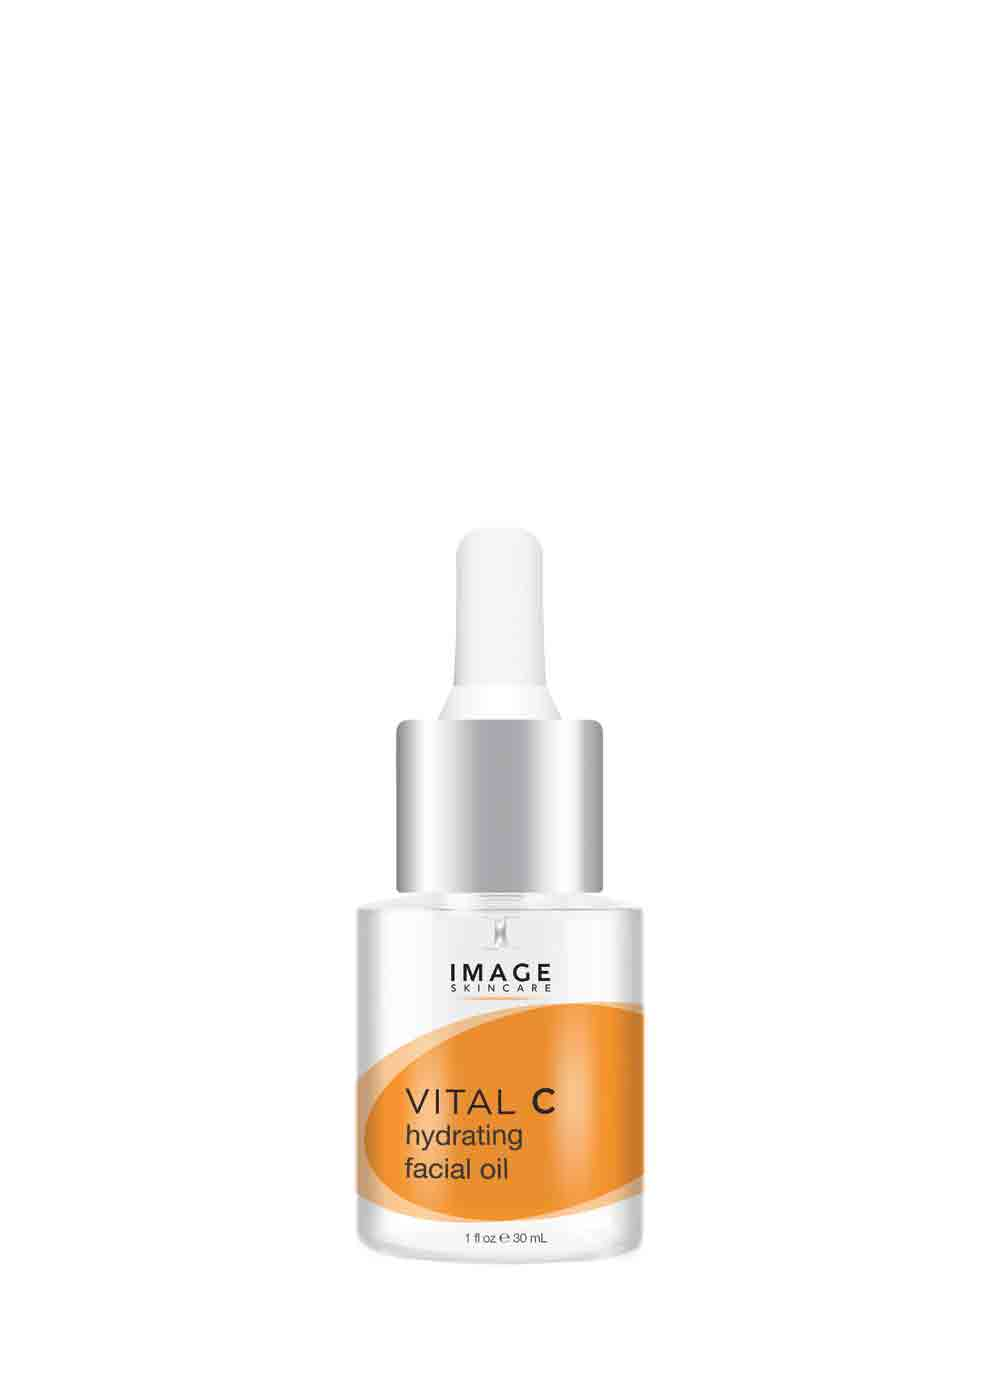 VITAL C hydrating facial oil huile hydratante